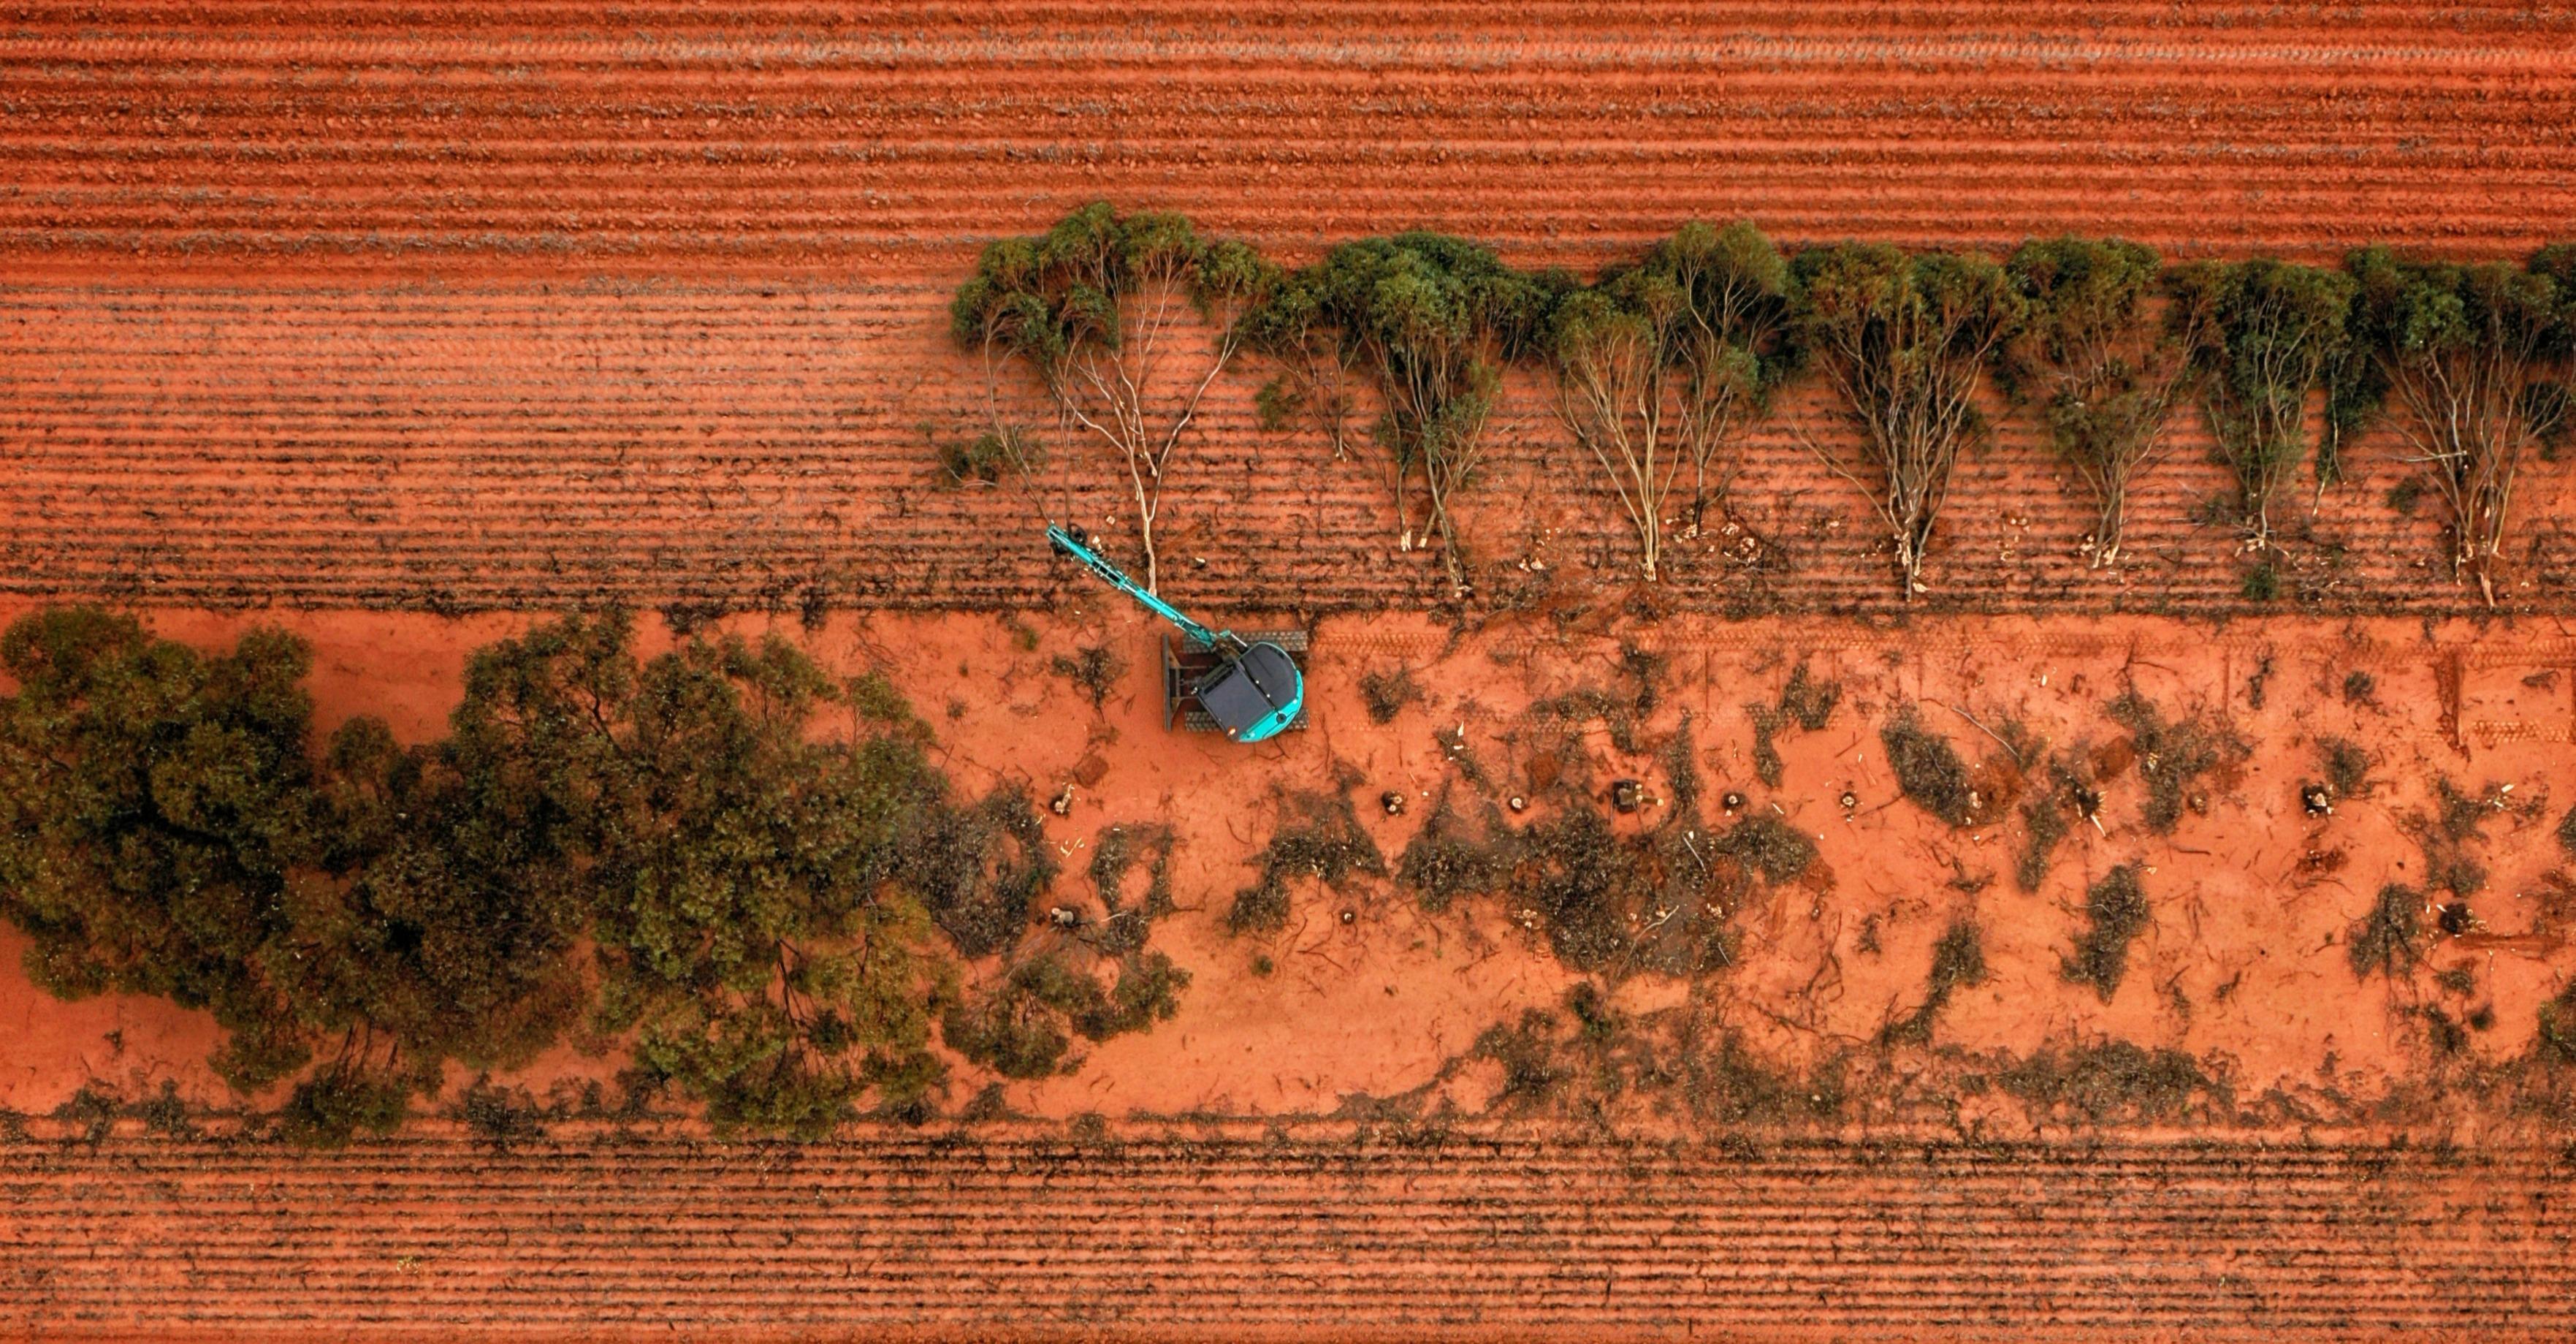 Saving Kochii trees by harvesting them